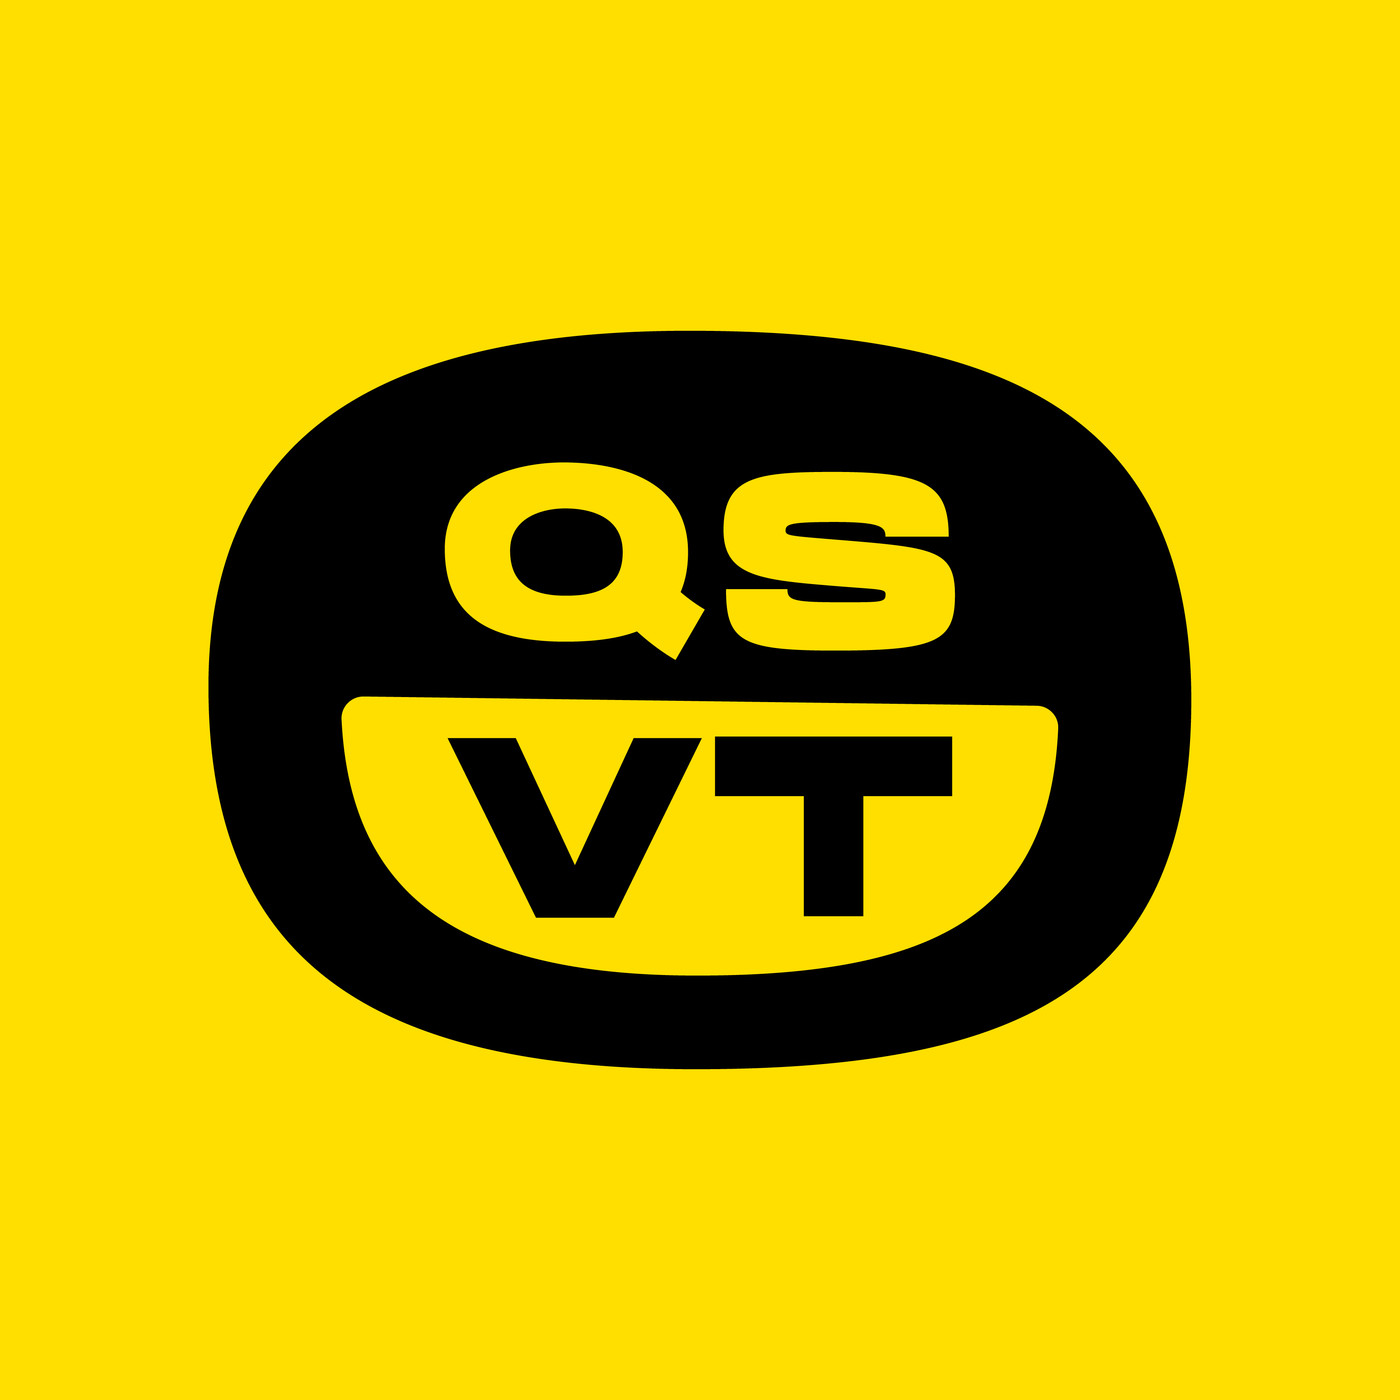 QSVTM461 Semana del Porno